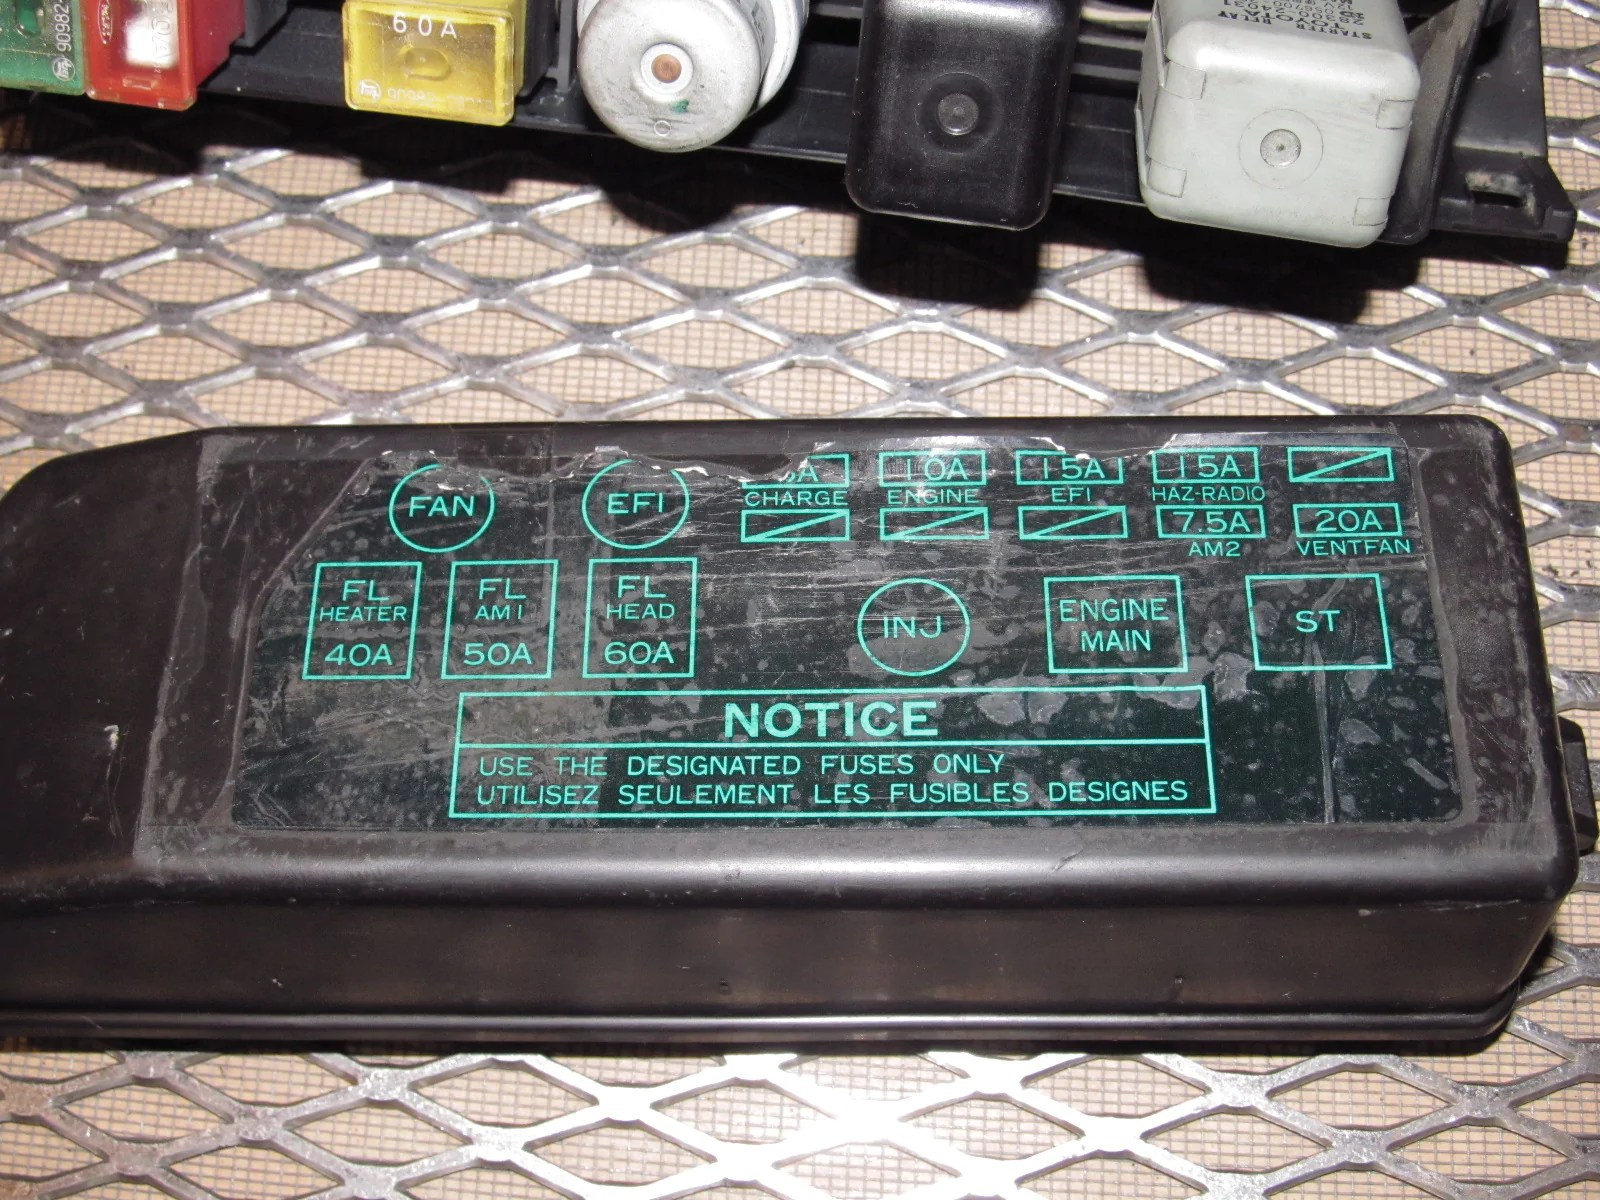 1987 toyota mr2 fuse box diagram wiring diagram advance 1991 toyota mr2 fuse box diagram aw11 mr2 fuse box diagram [ 1600 x 1200 Pixel ]